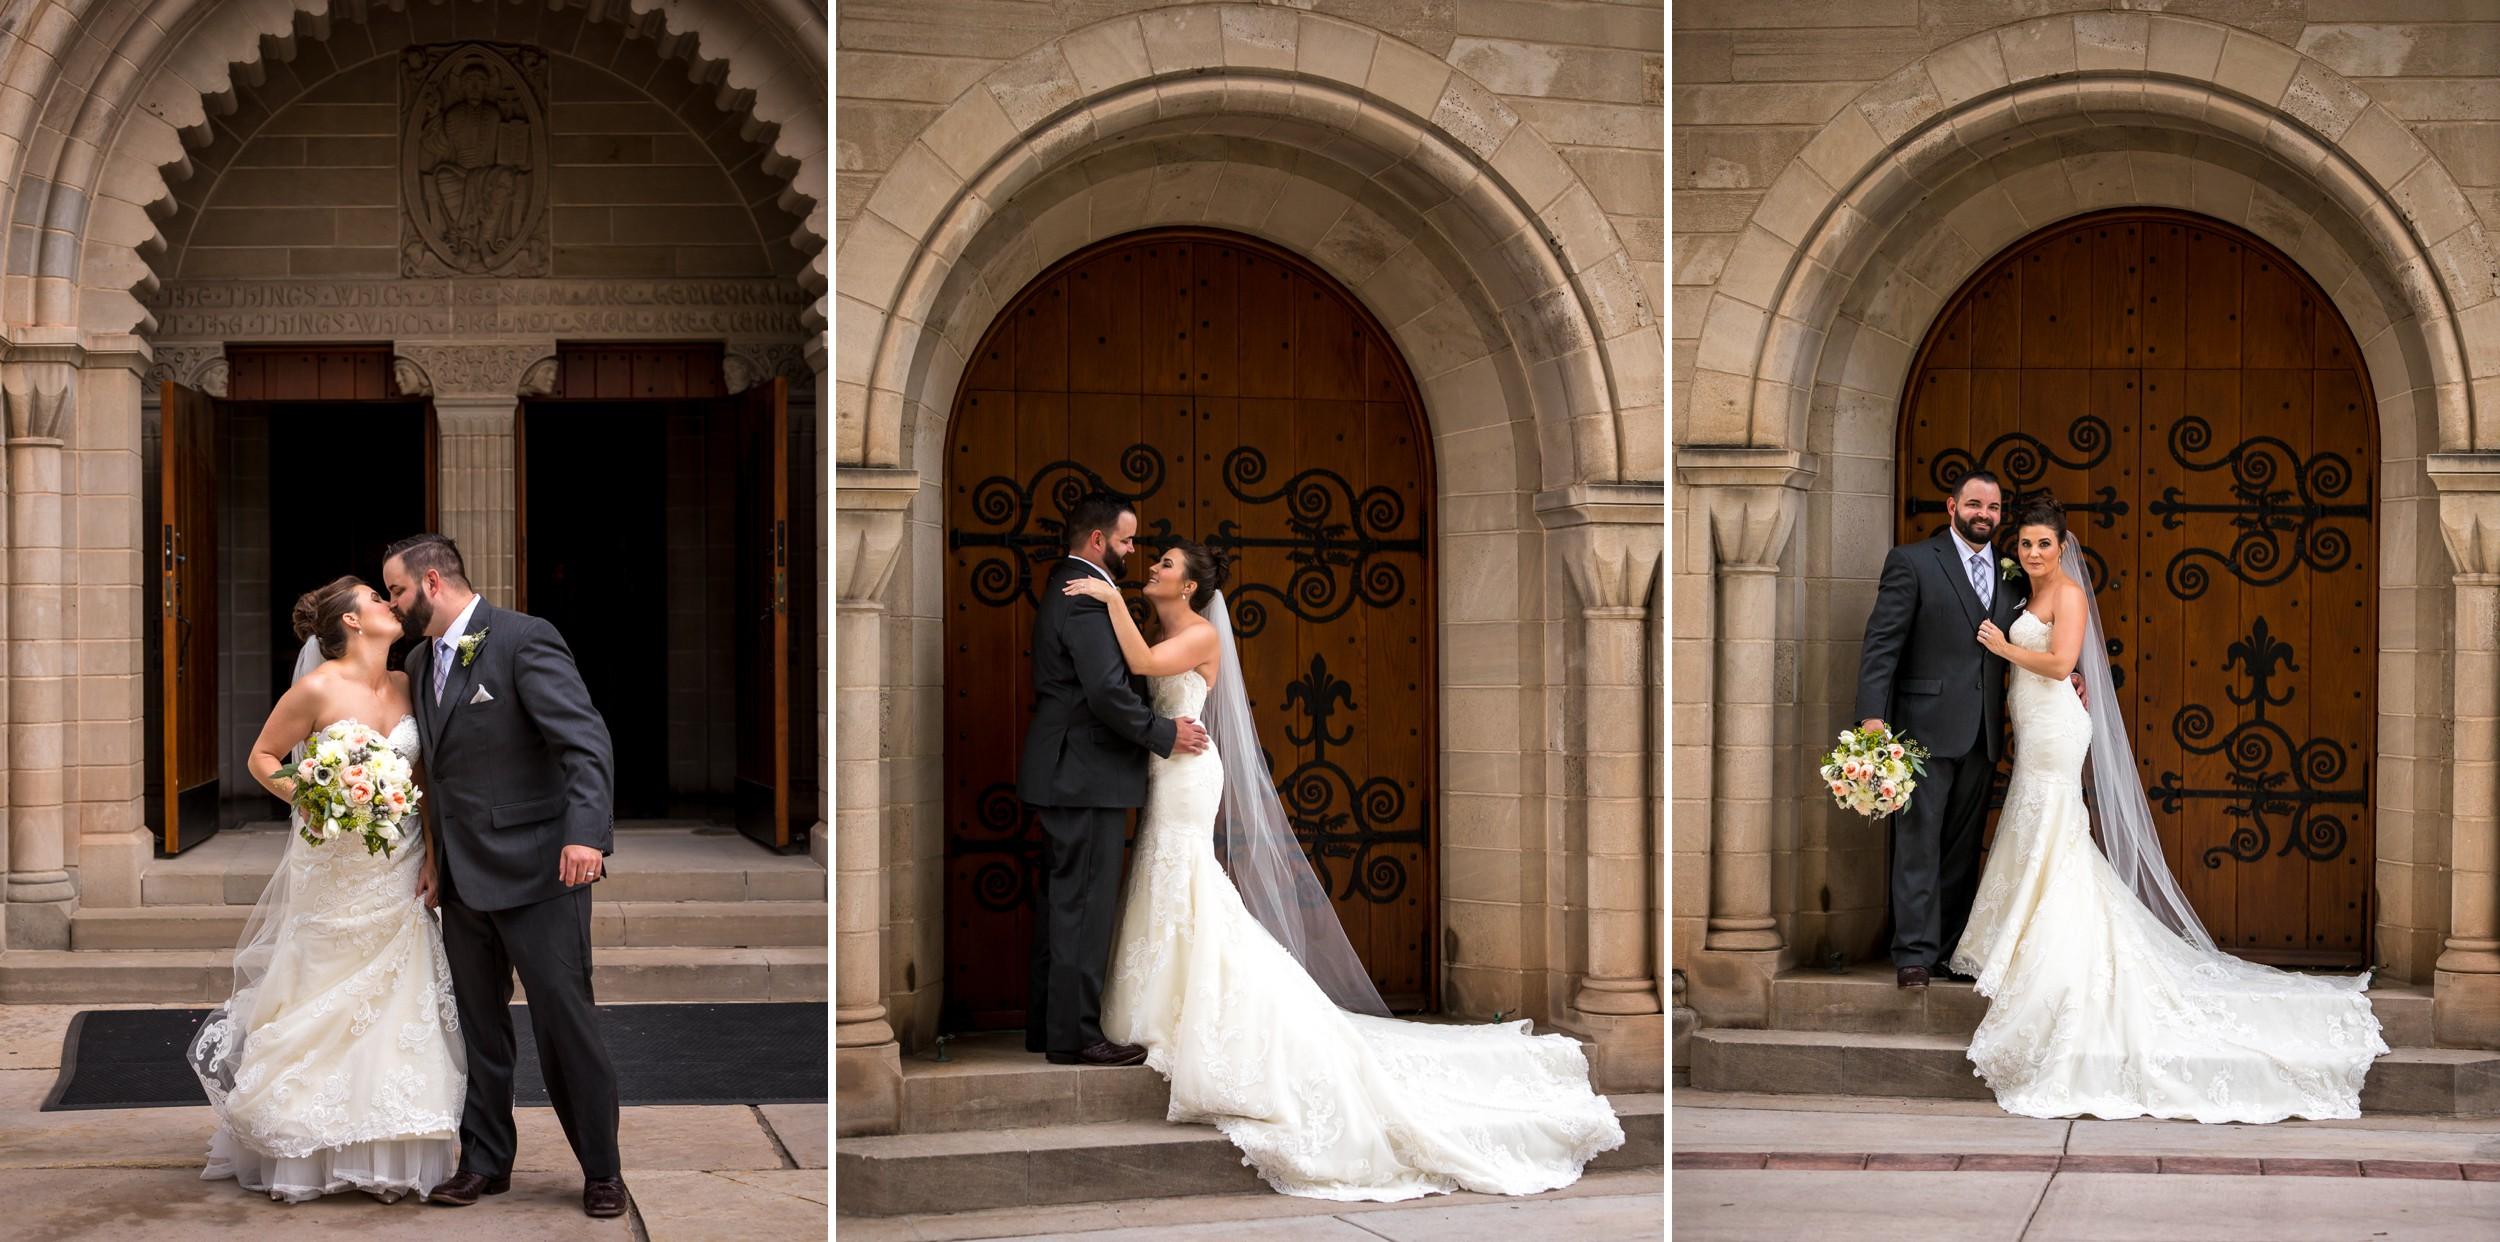 Criddle Wedding 8.jpg